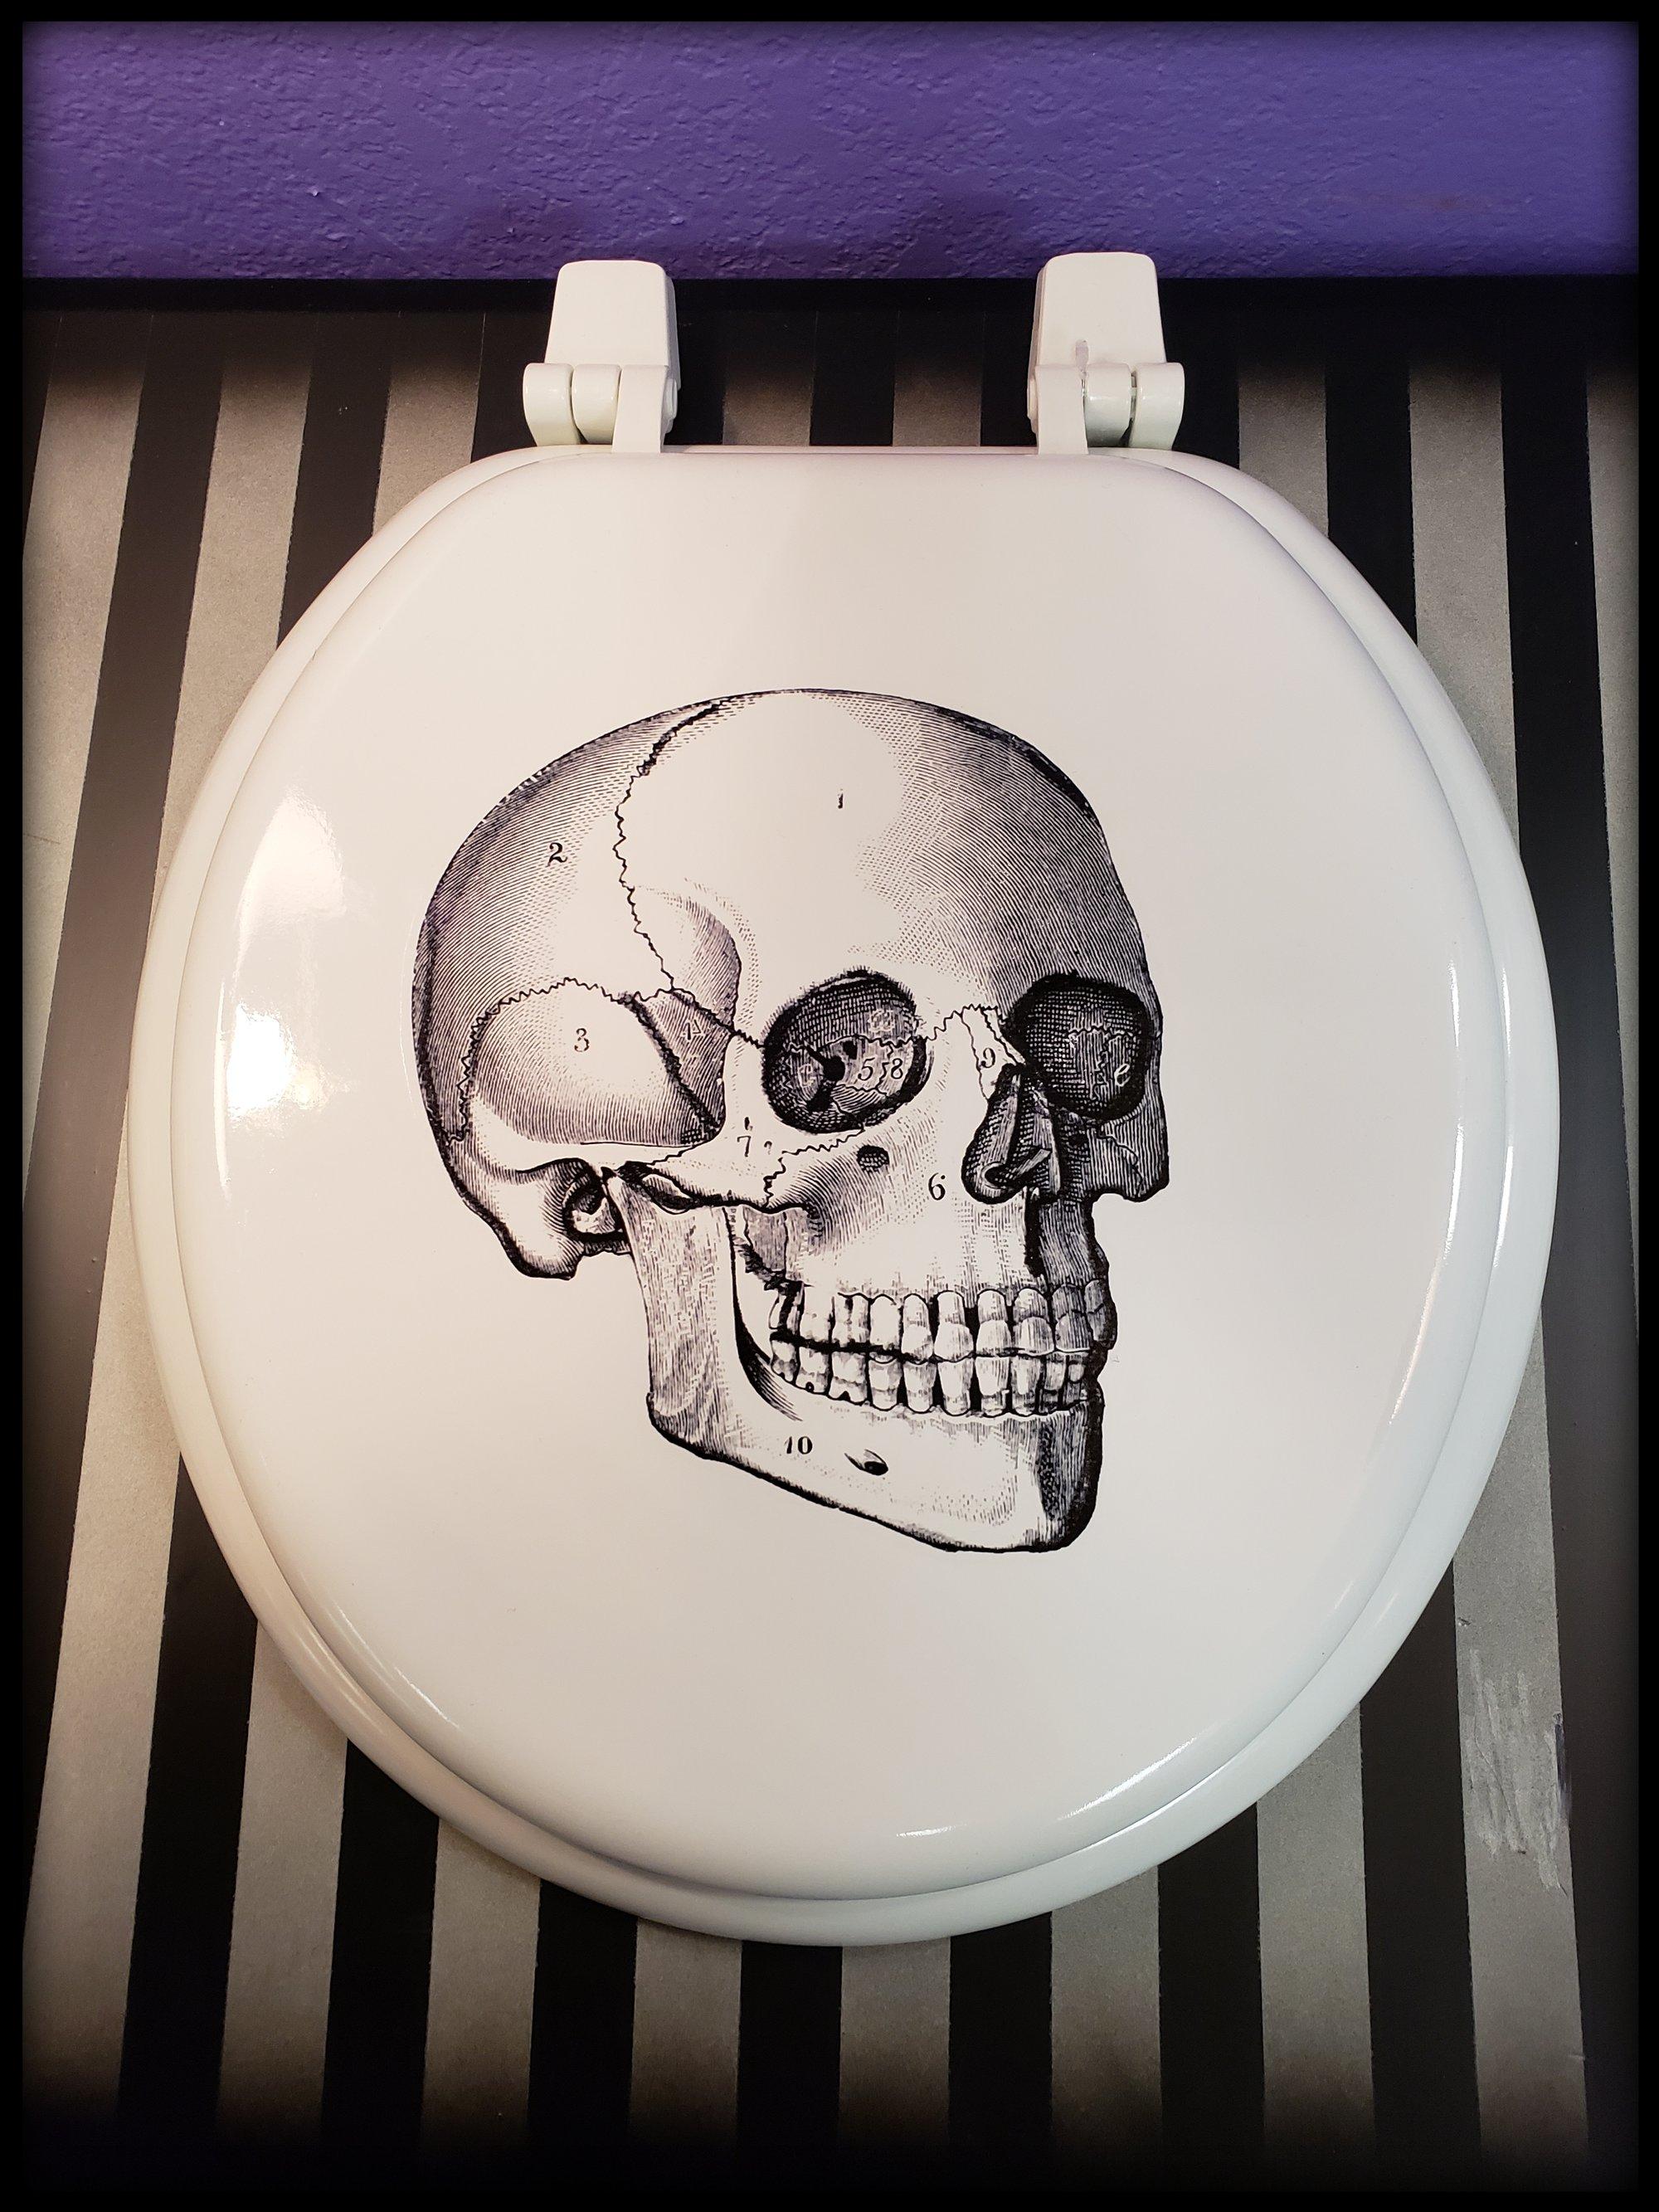 Tremendous Skull Toilet Seat Beatyapartments Chair Design Images Beatyapartmentscom